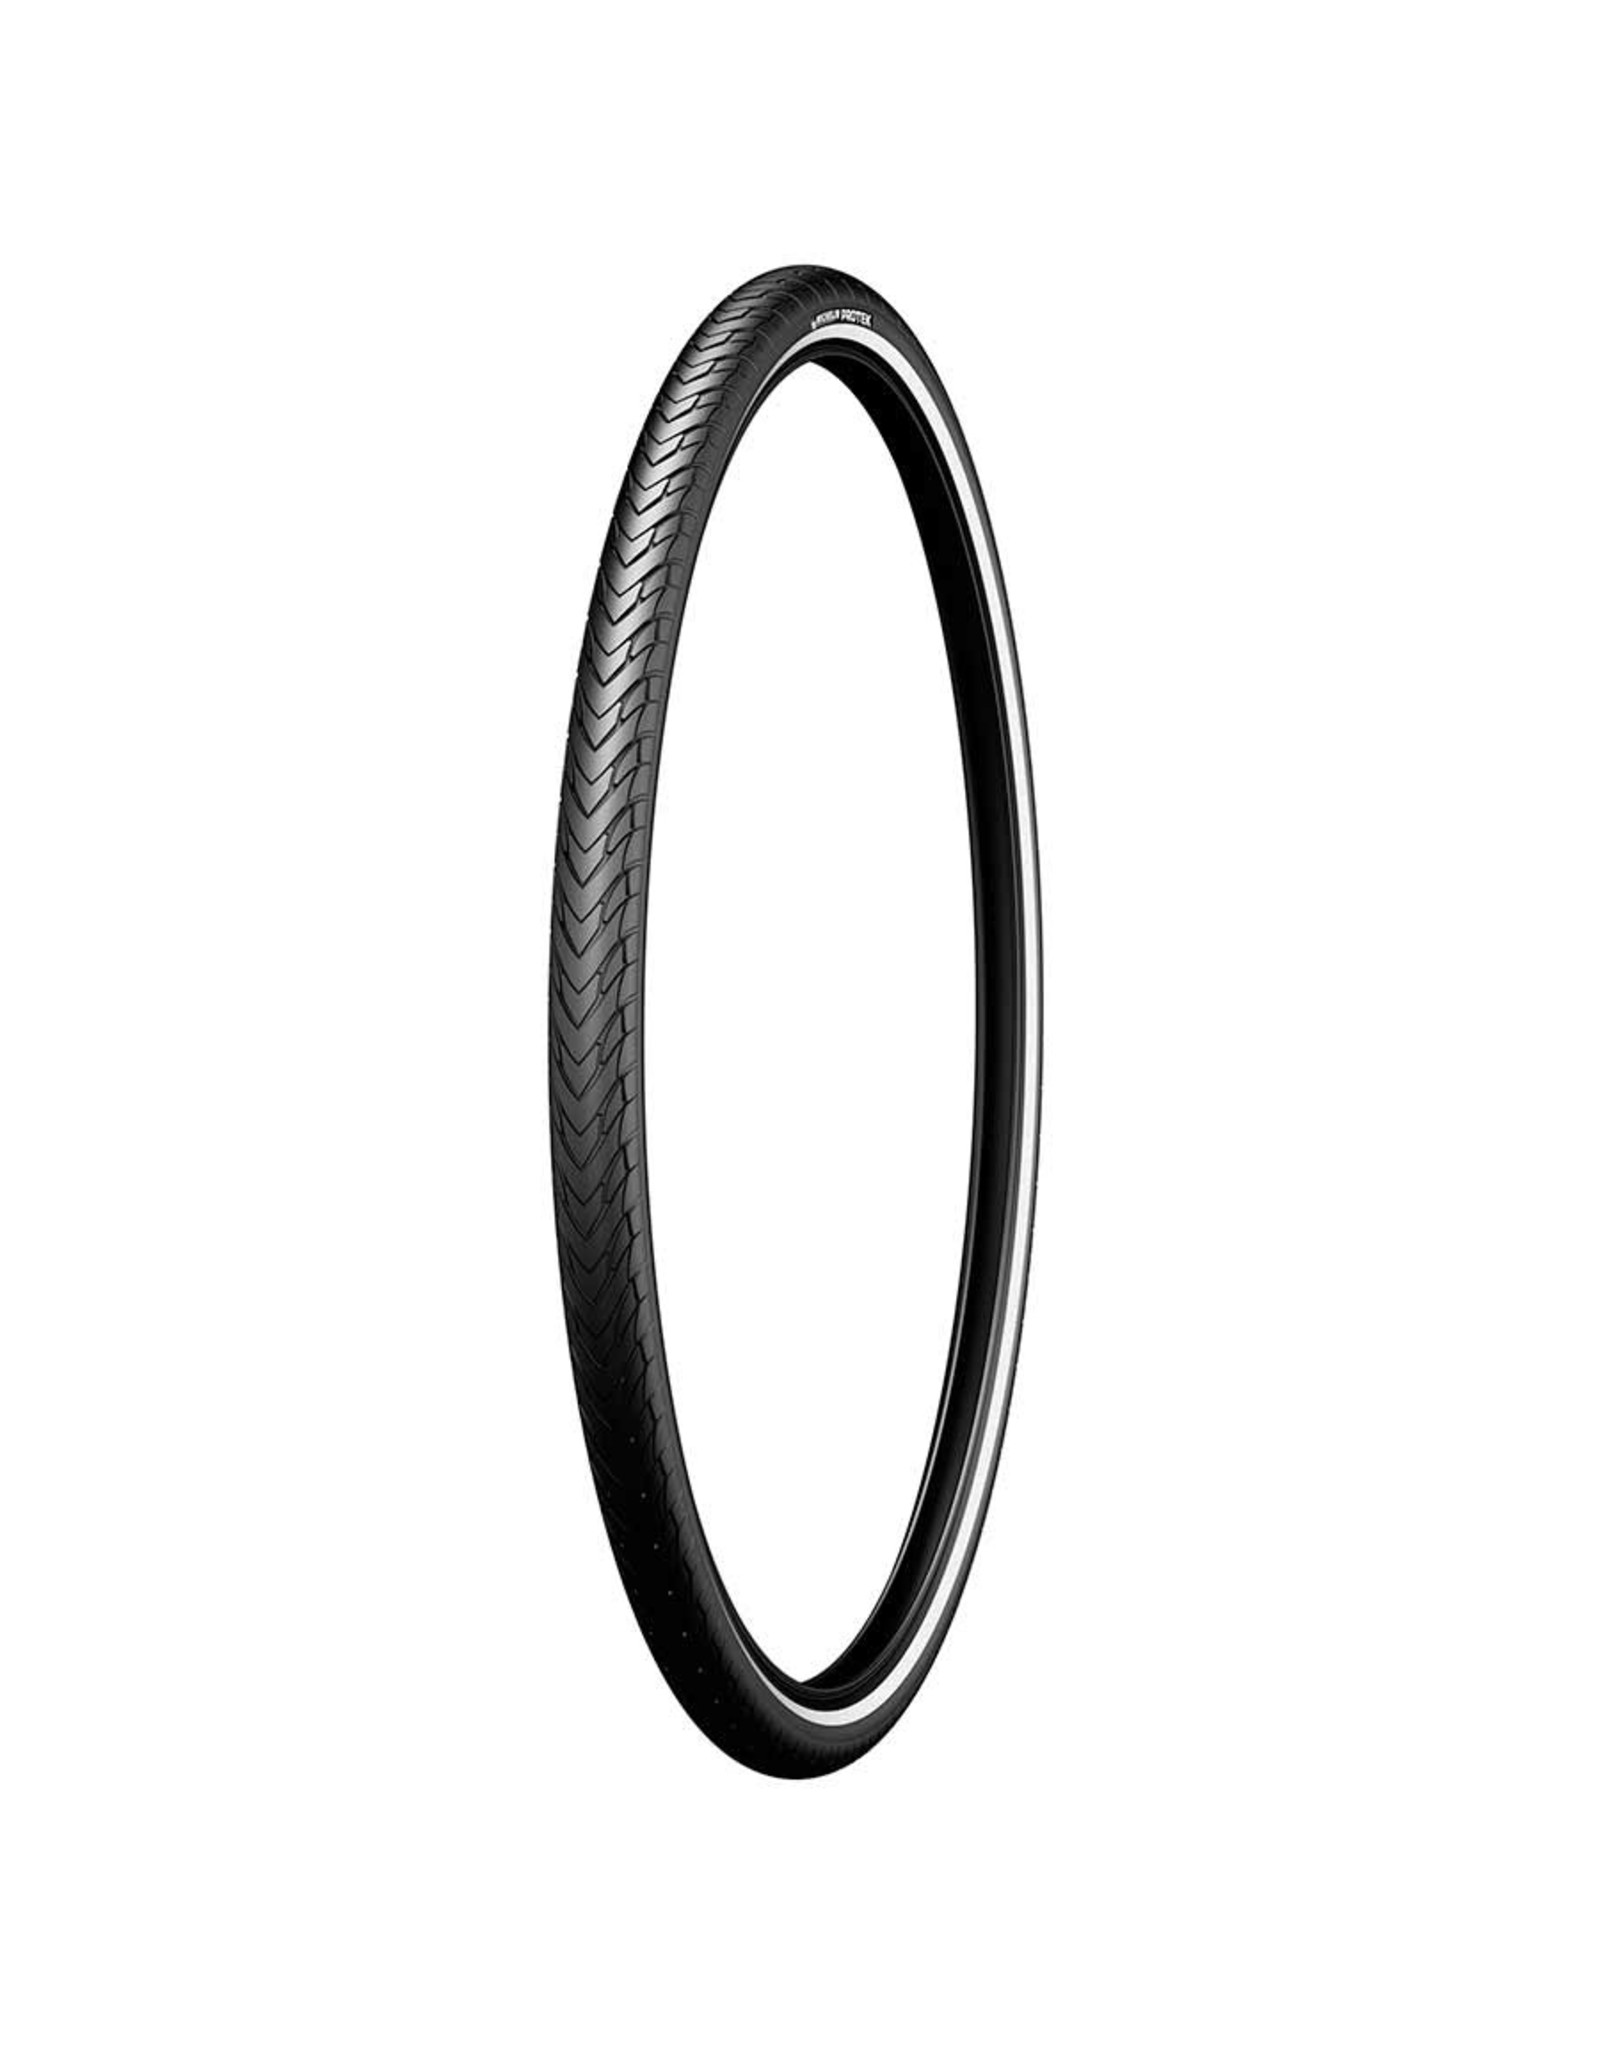 Michelin, Protek, Tire, 700x32C, Wire, Clincher, Protek 1mm, Reflex, 22TPI, Black